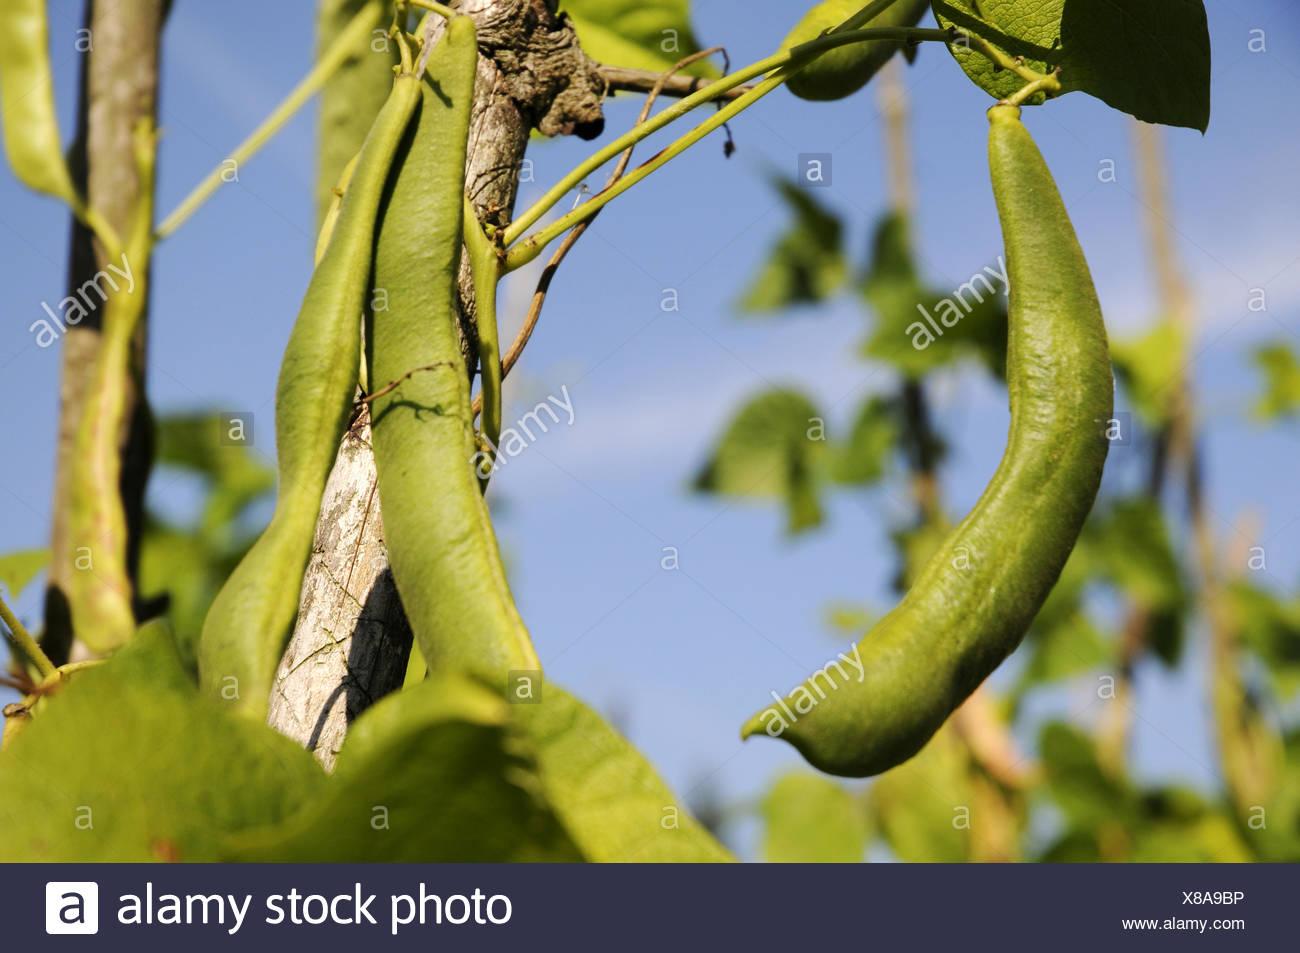 Harvest maturity beans - Stock Image